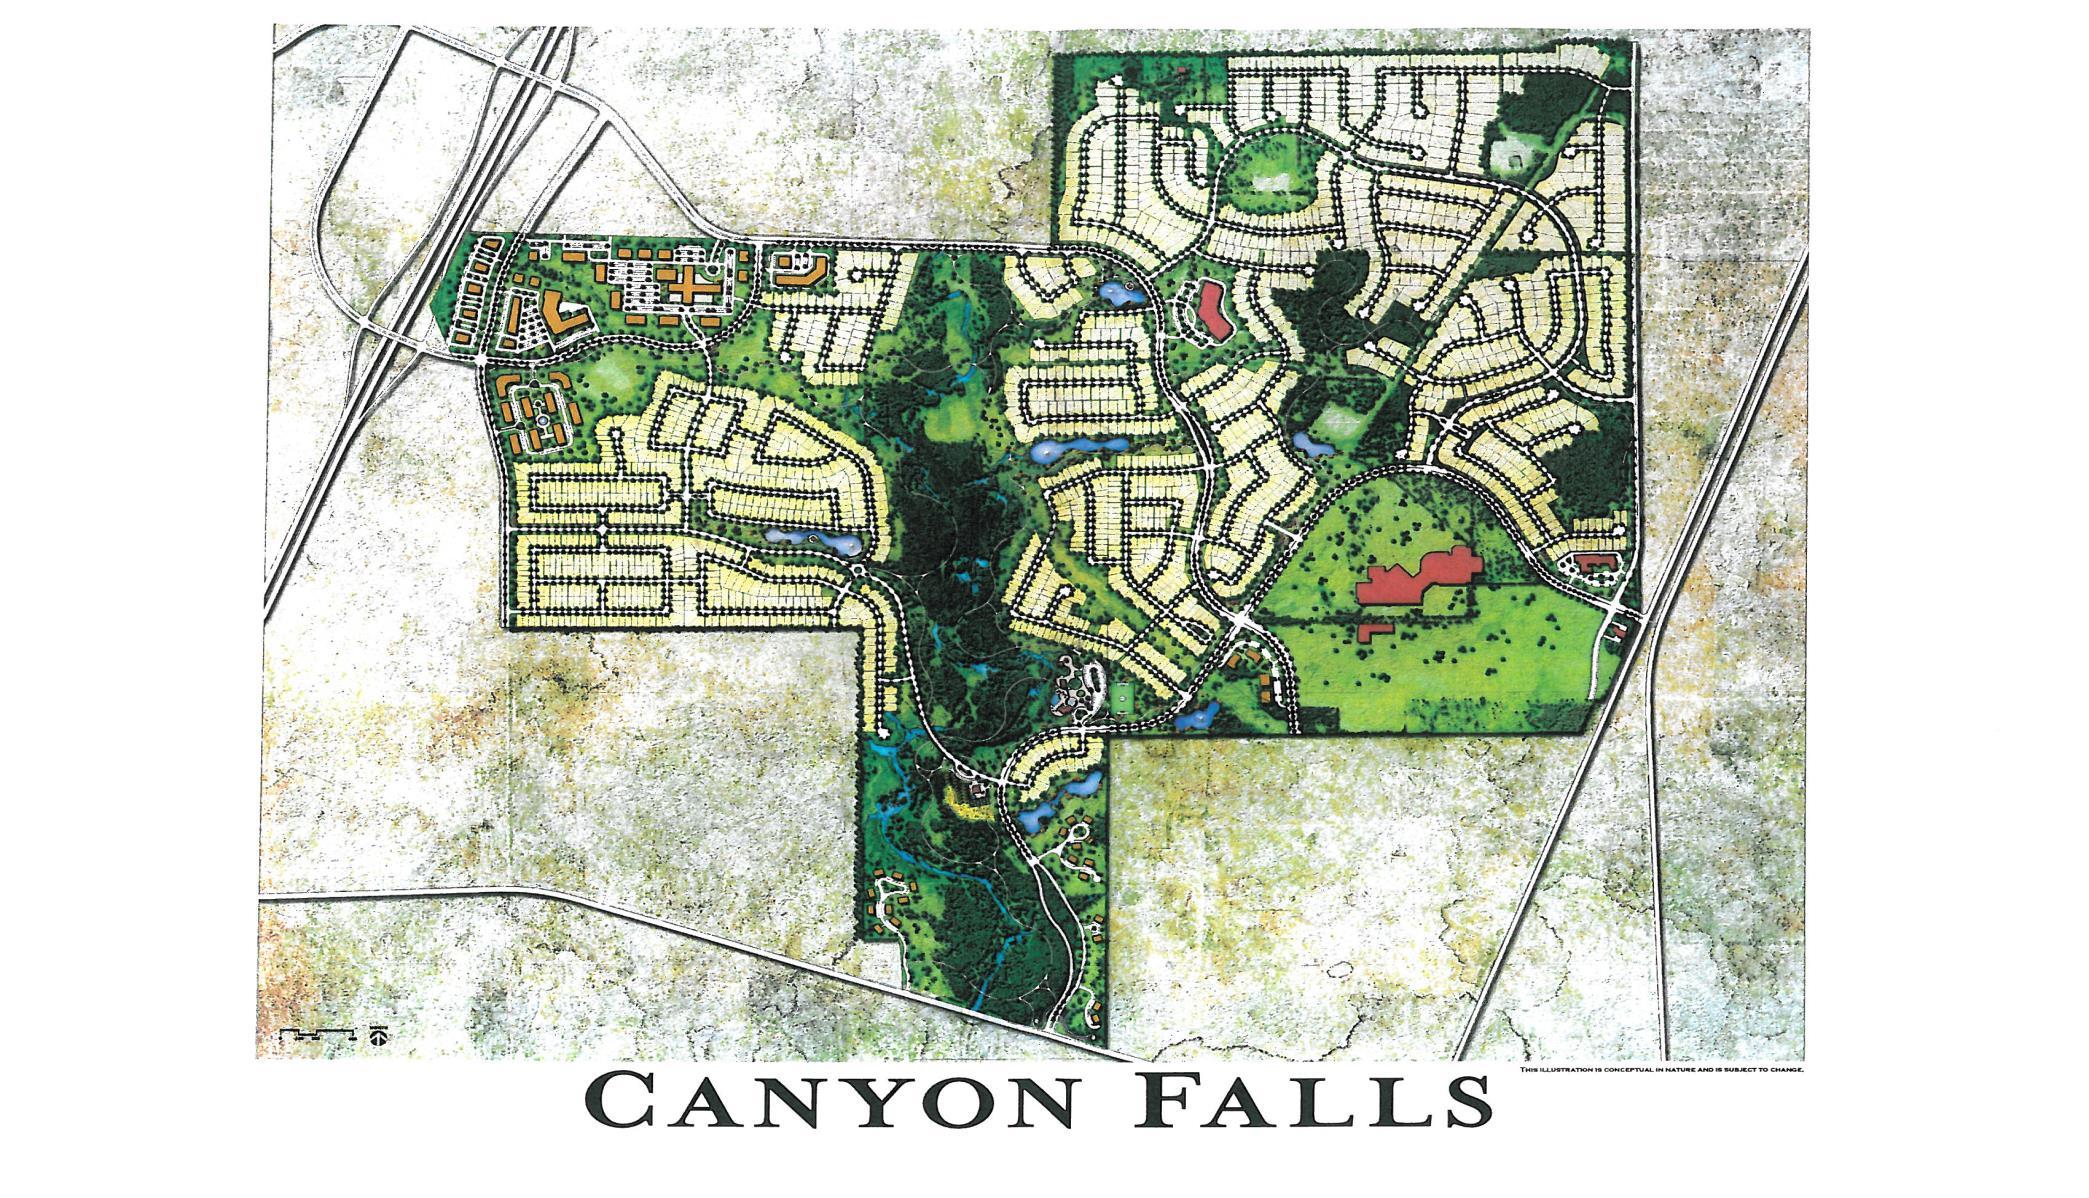 Flower Mound TX ficial Website Canyon Falls